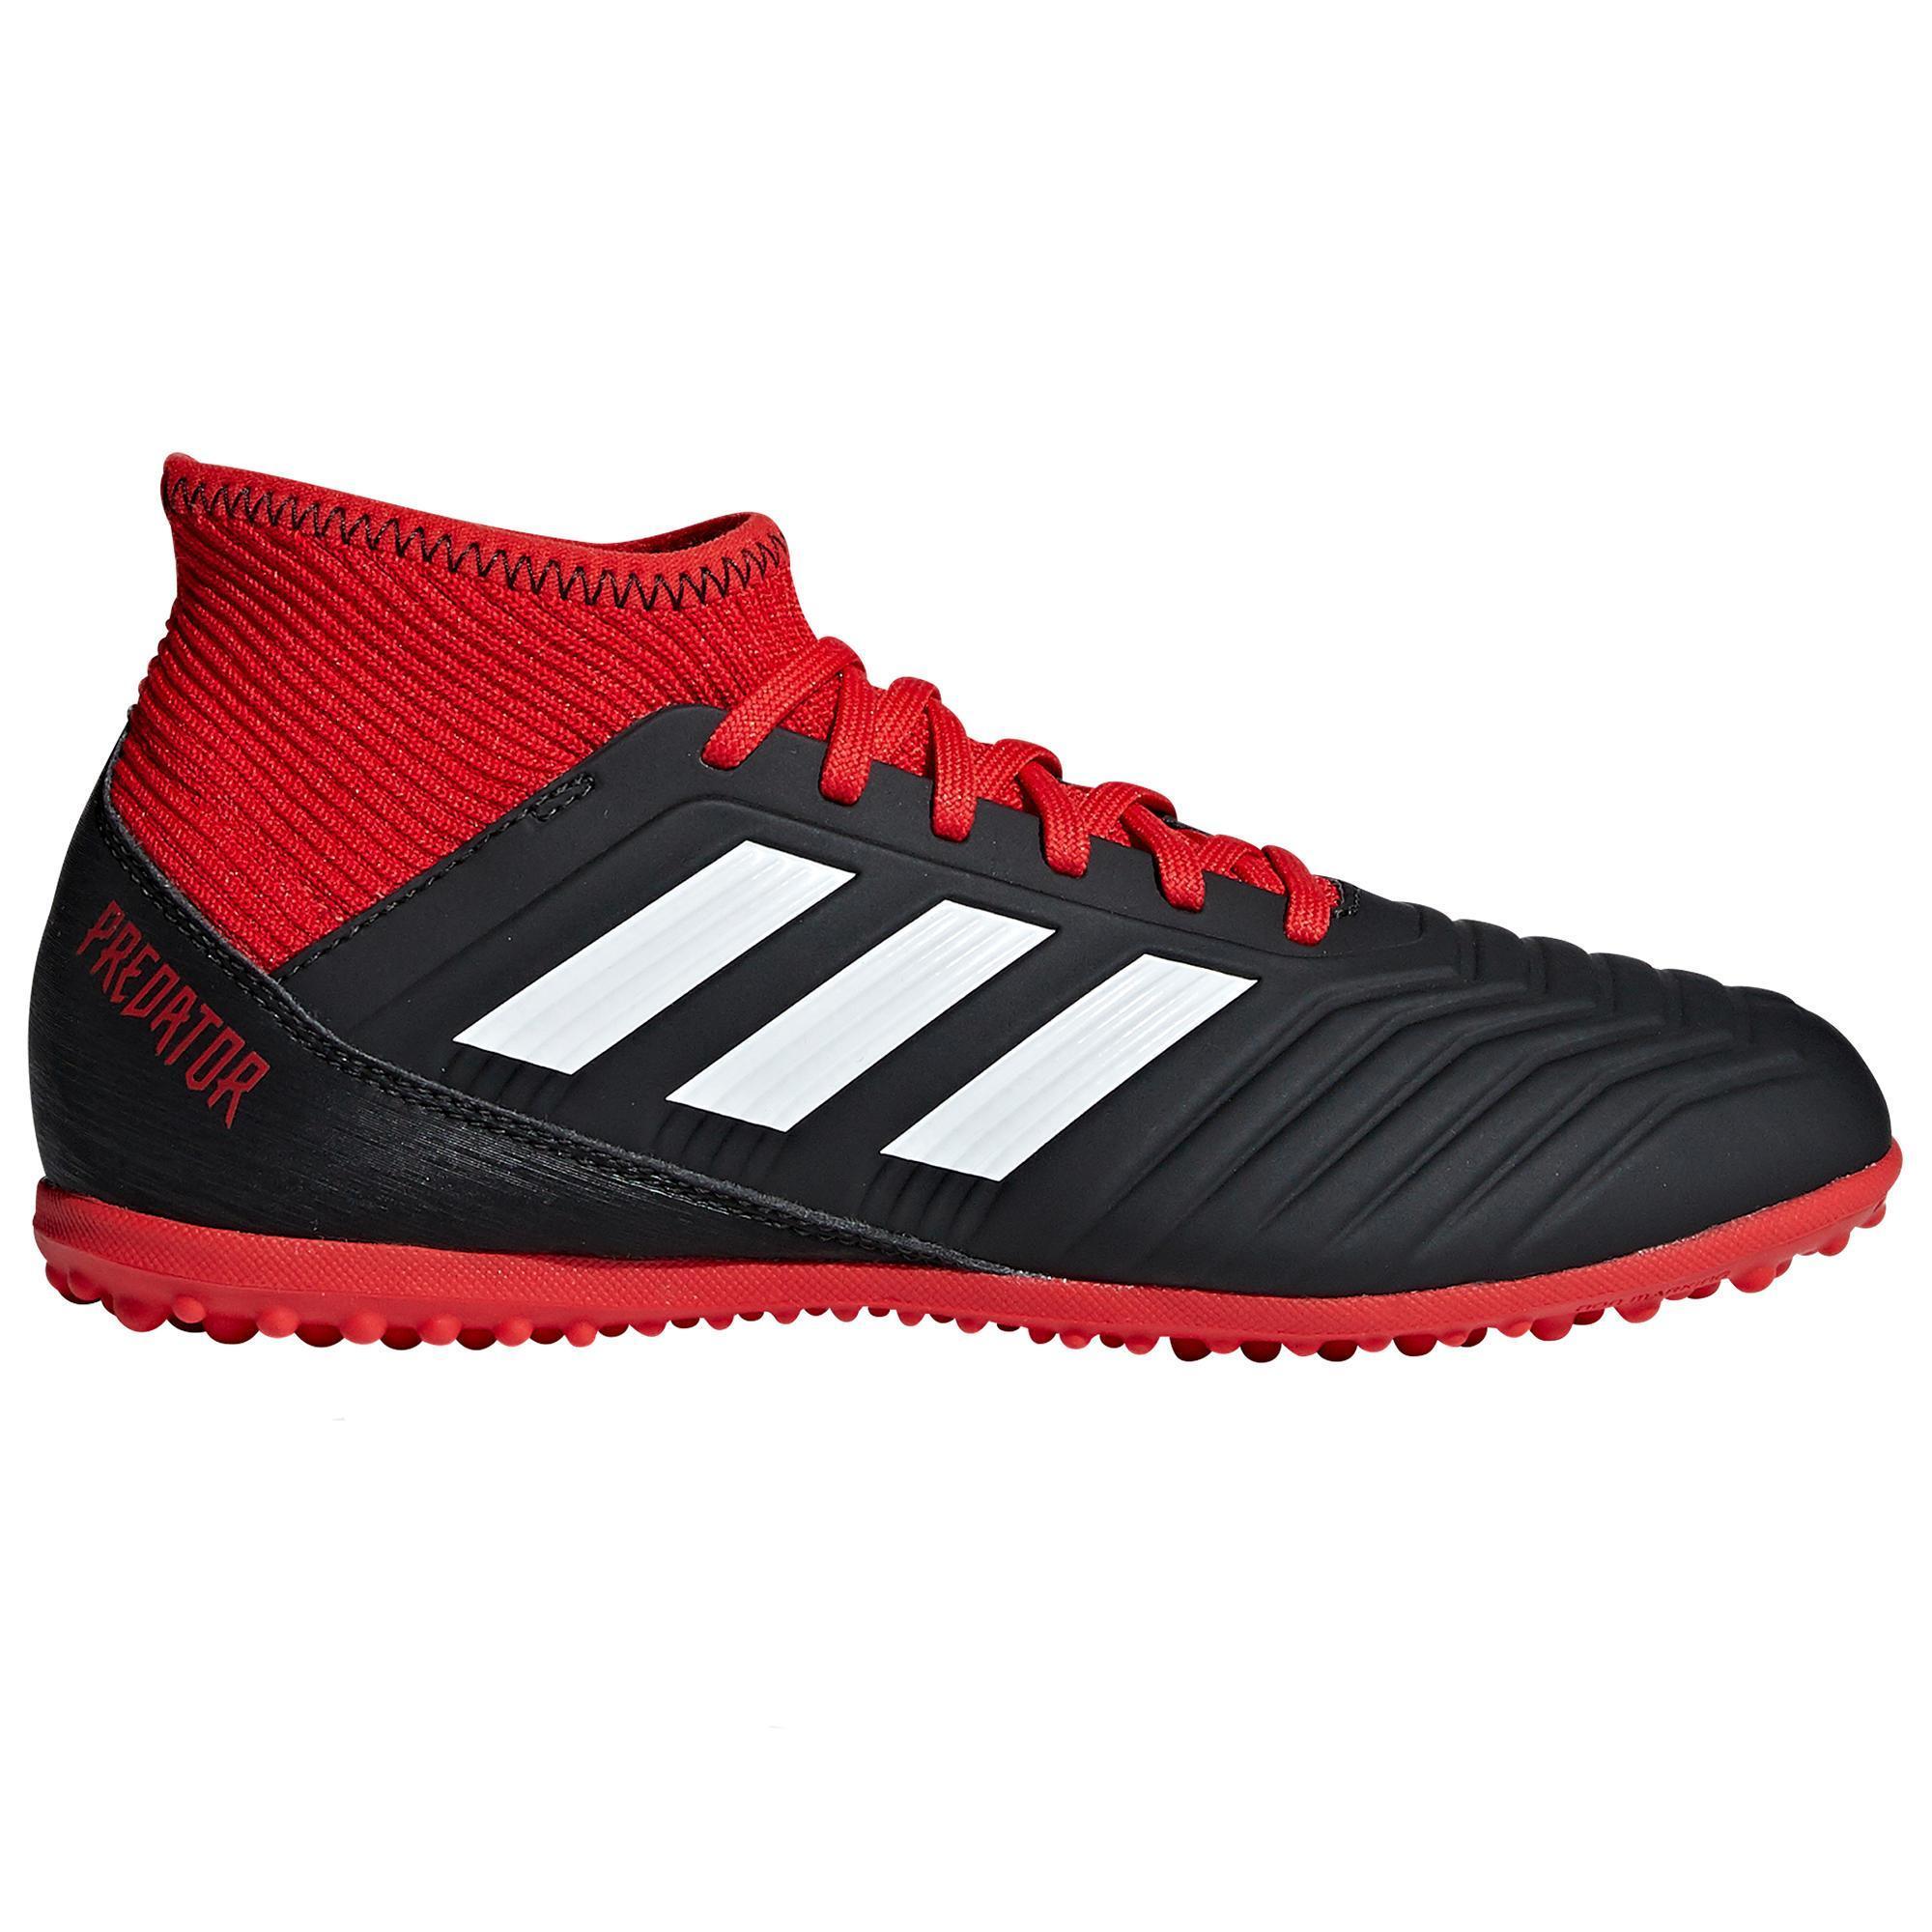 8109107e0 Comprar Botas de Fútbol niños online